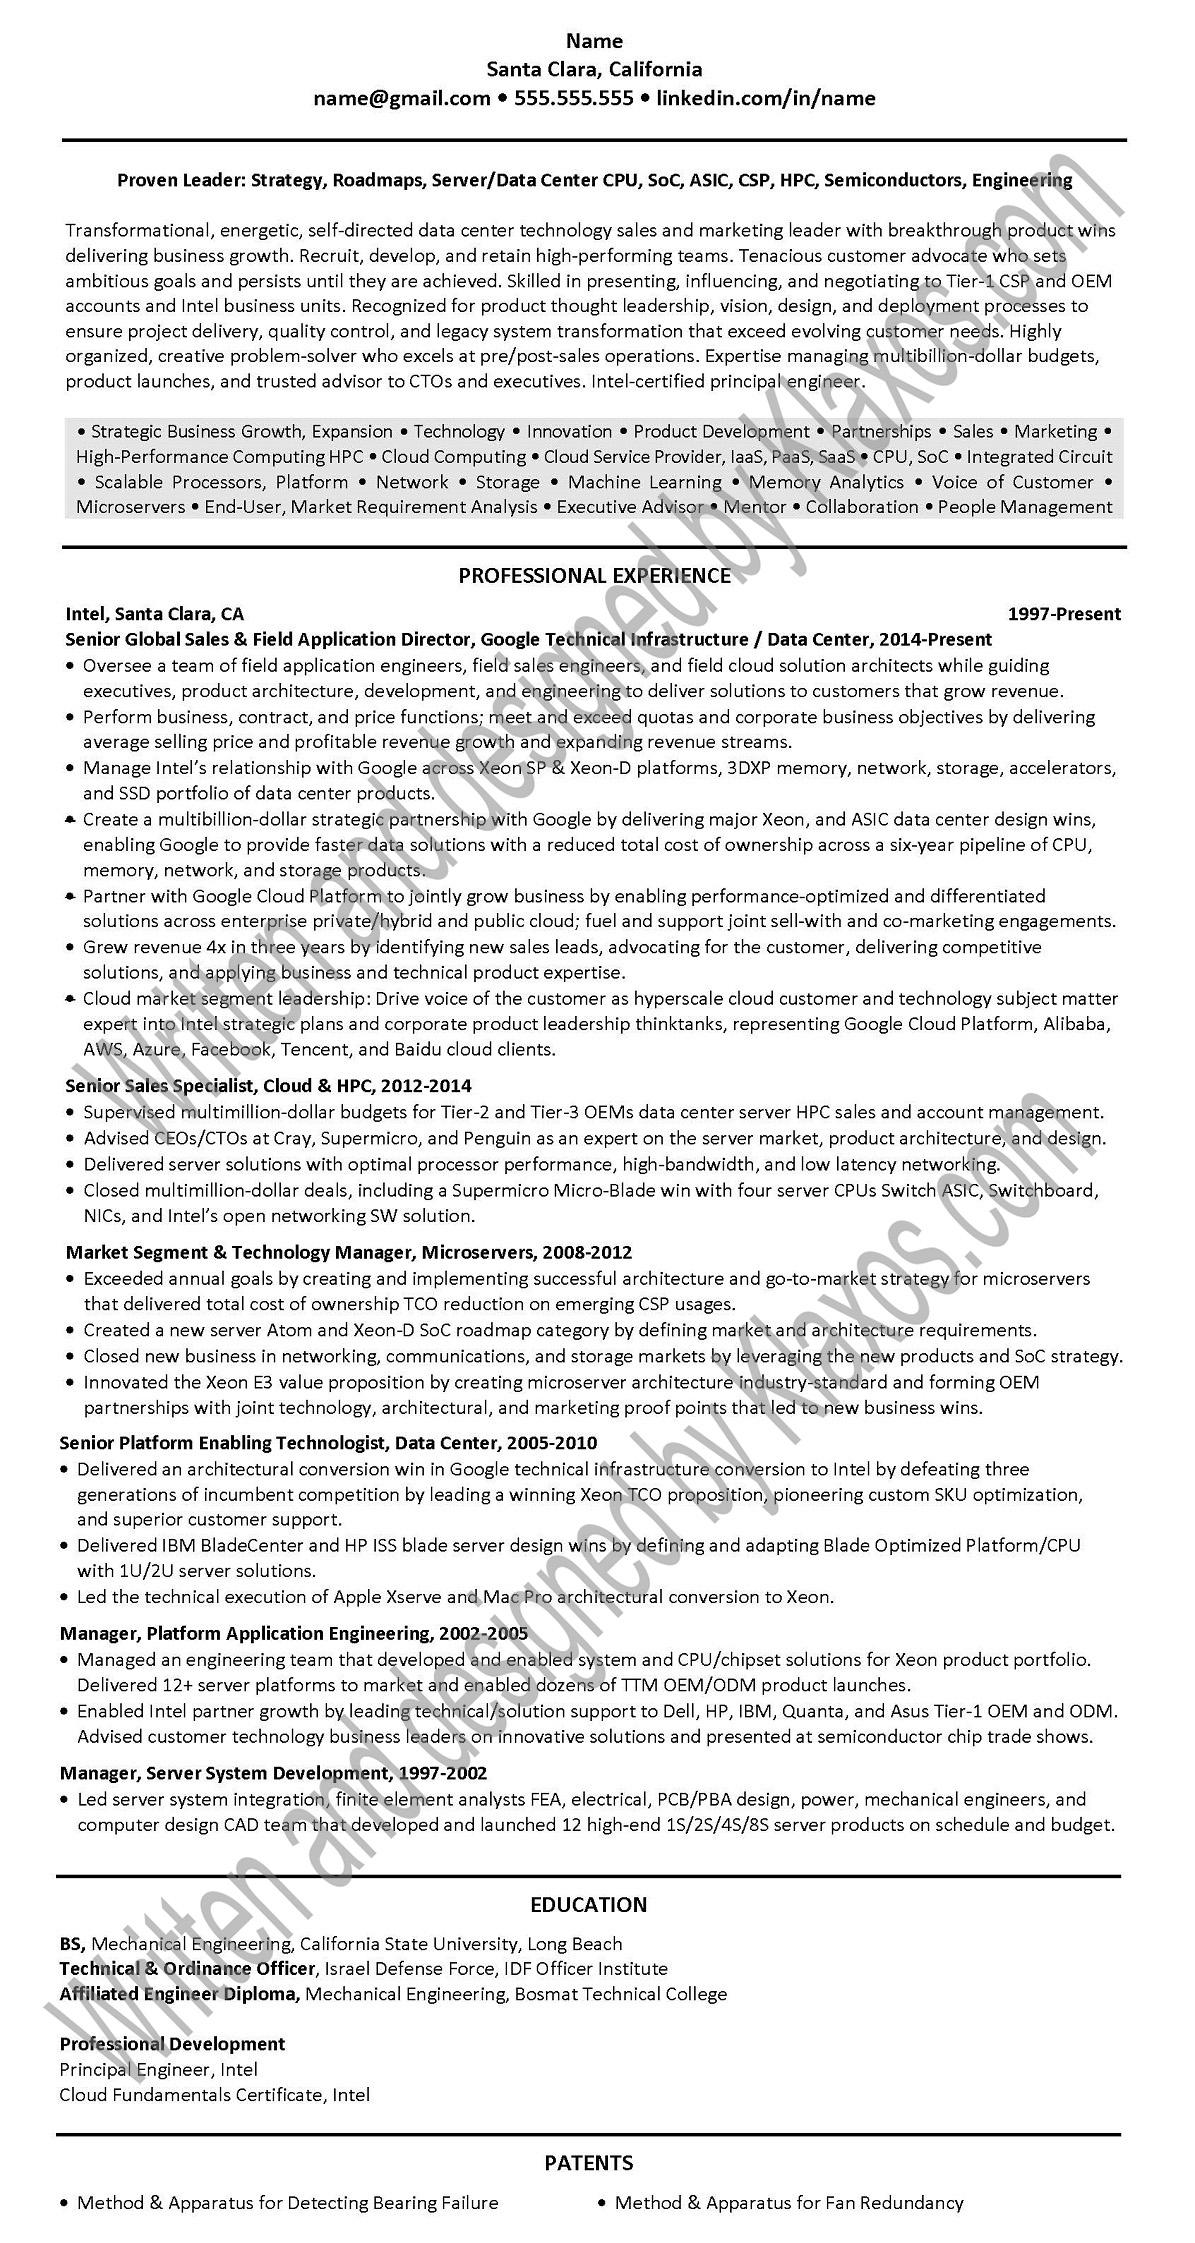 Resume 3431 1200px Watermark